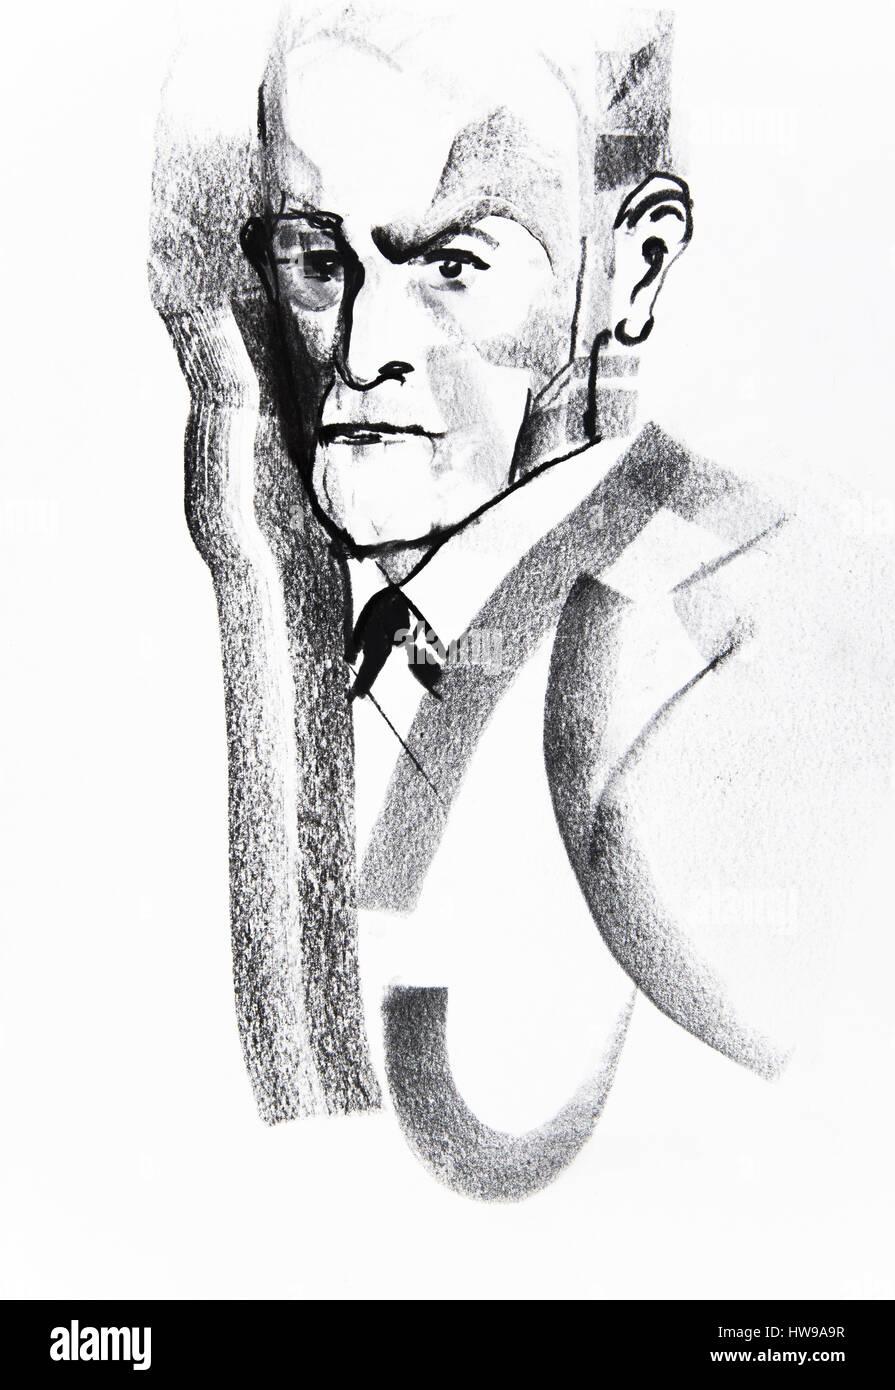 Sigmund Freud (1856-1939), neurologist and psychotherapist - illustration of Ewa KLOS ©Ewa KLOS/Opale - Stock Image